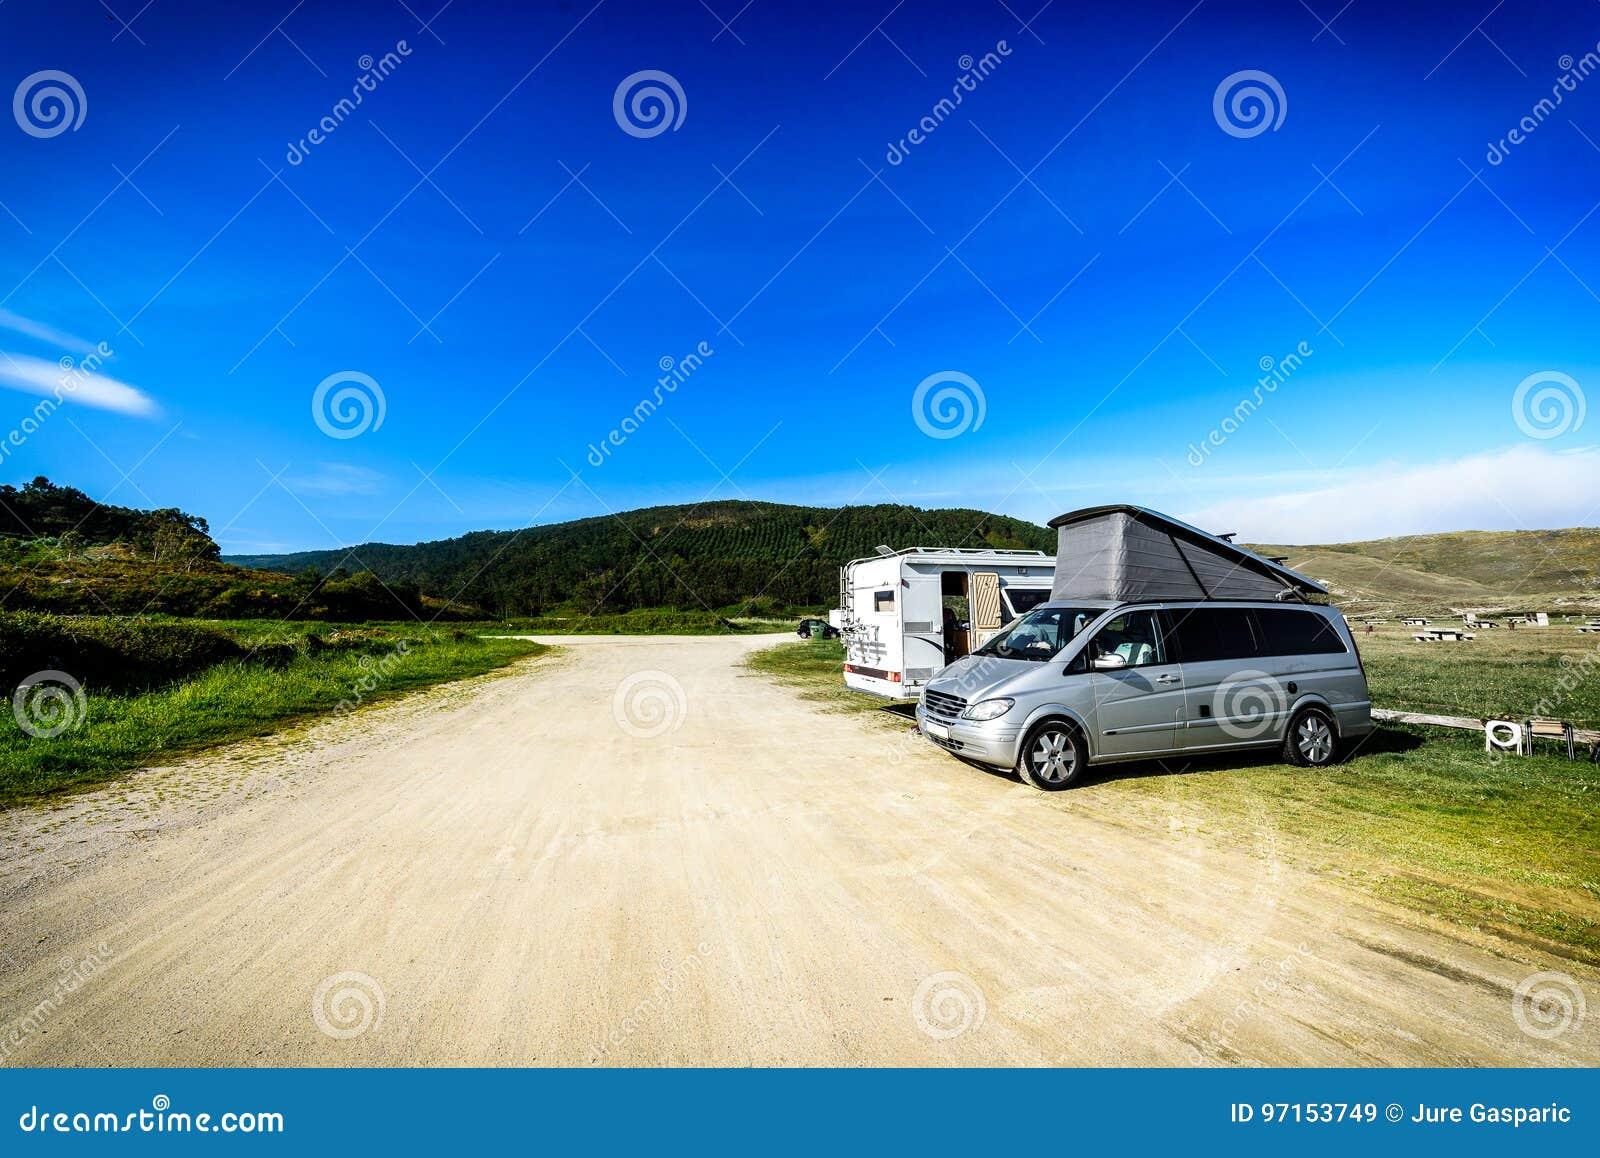 Motorhome RV和campervan在海滩停放